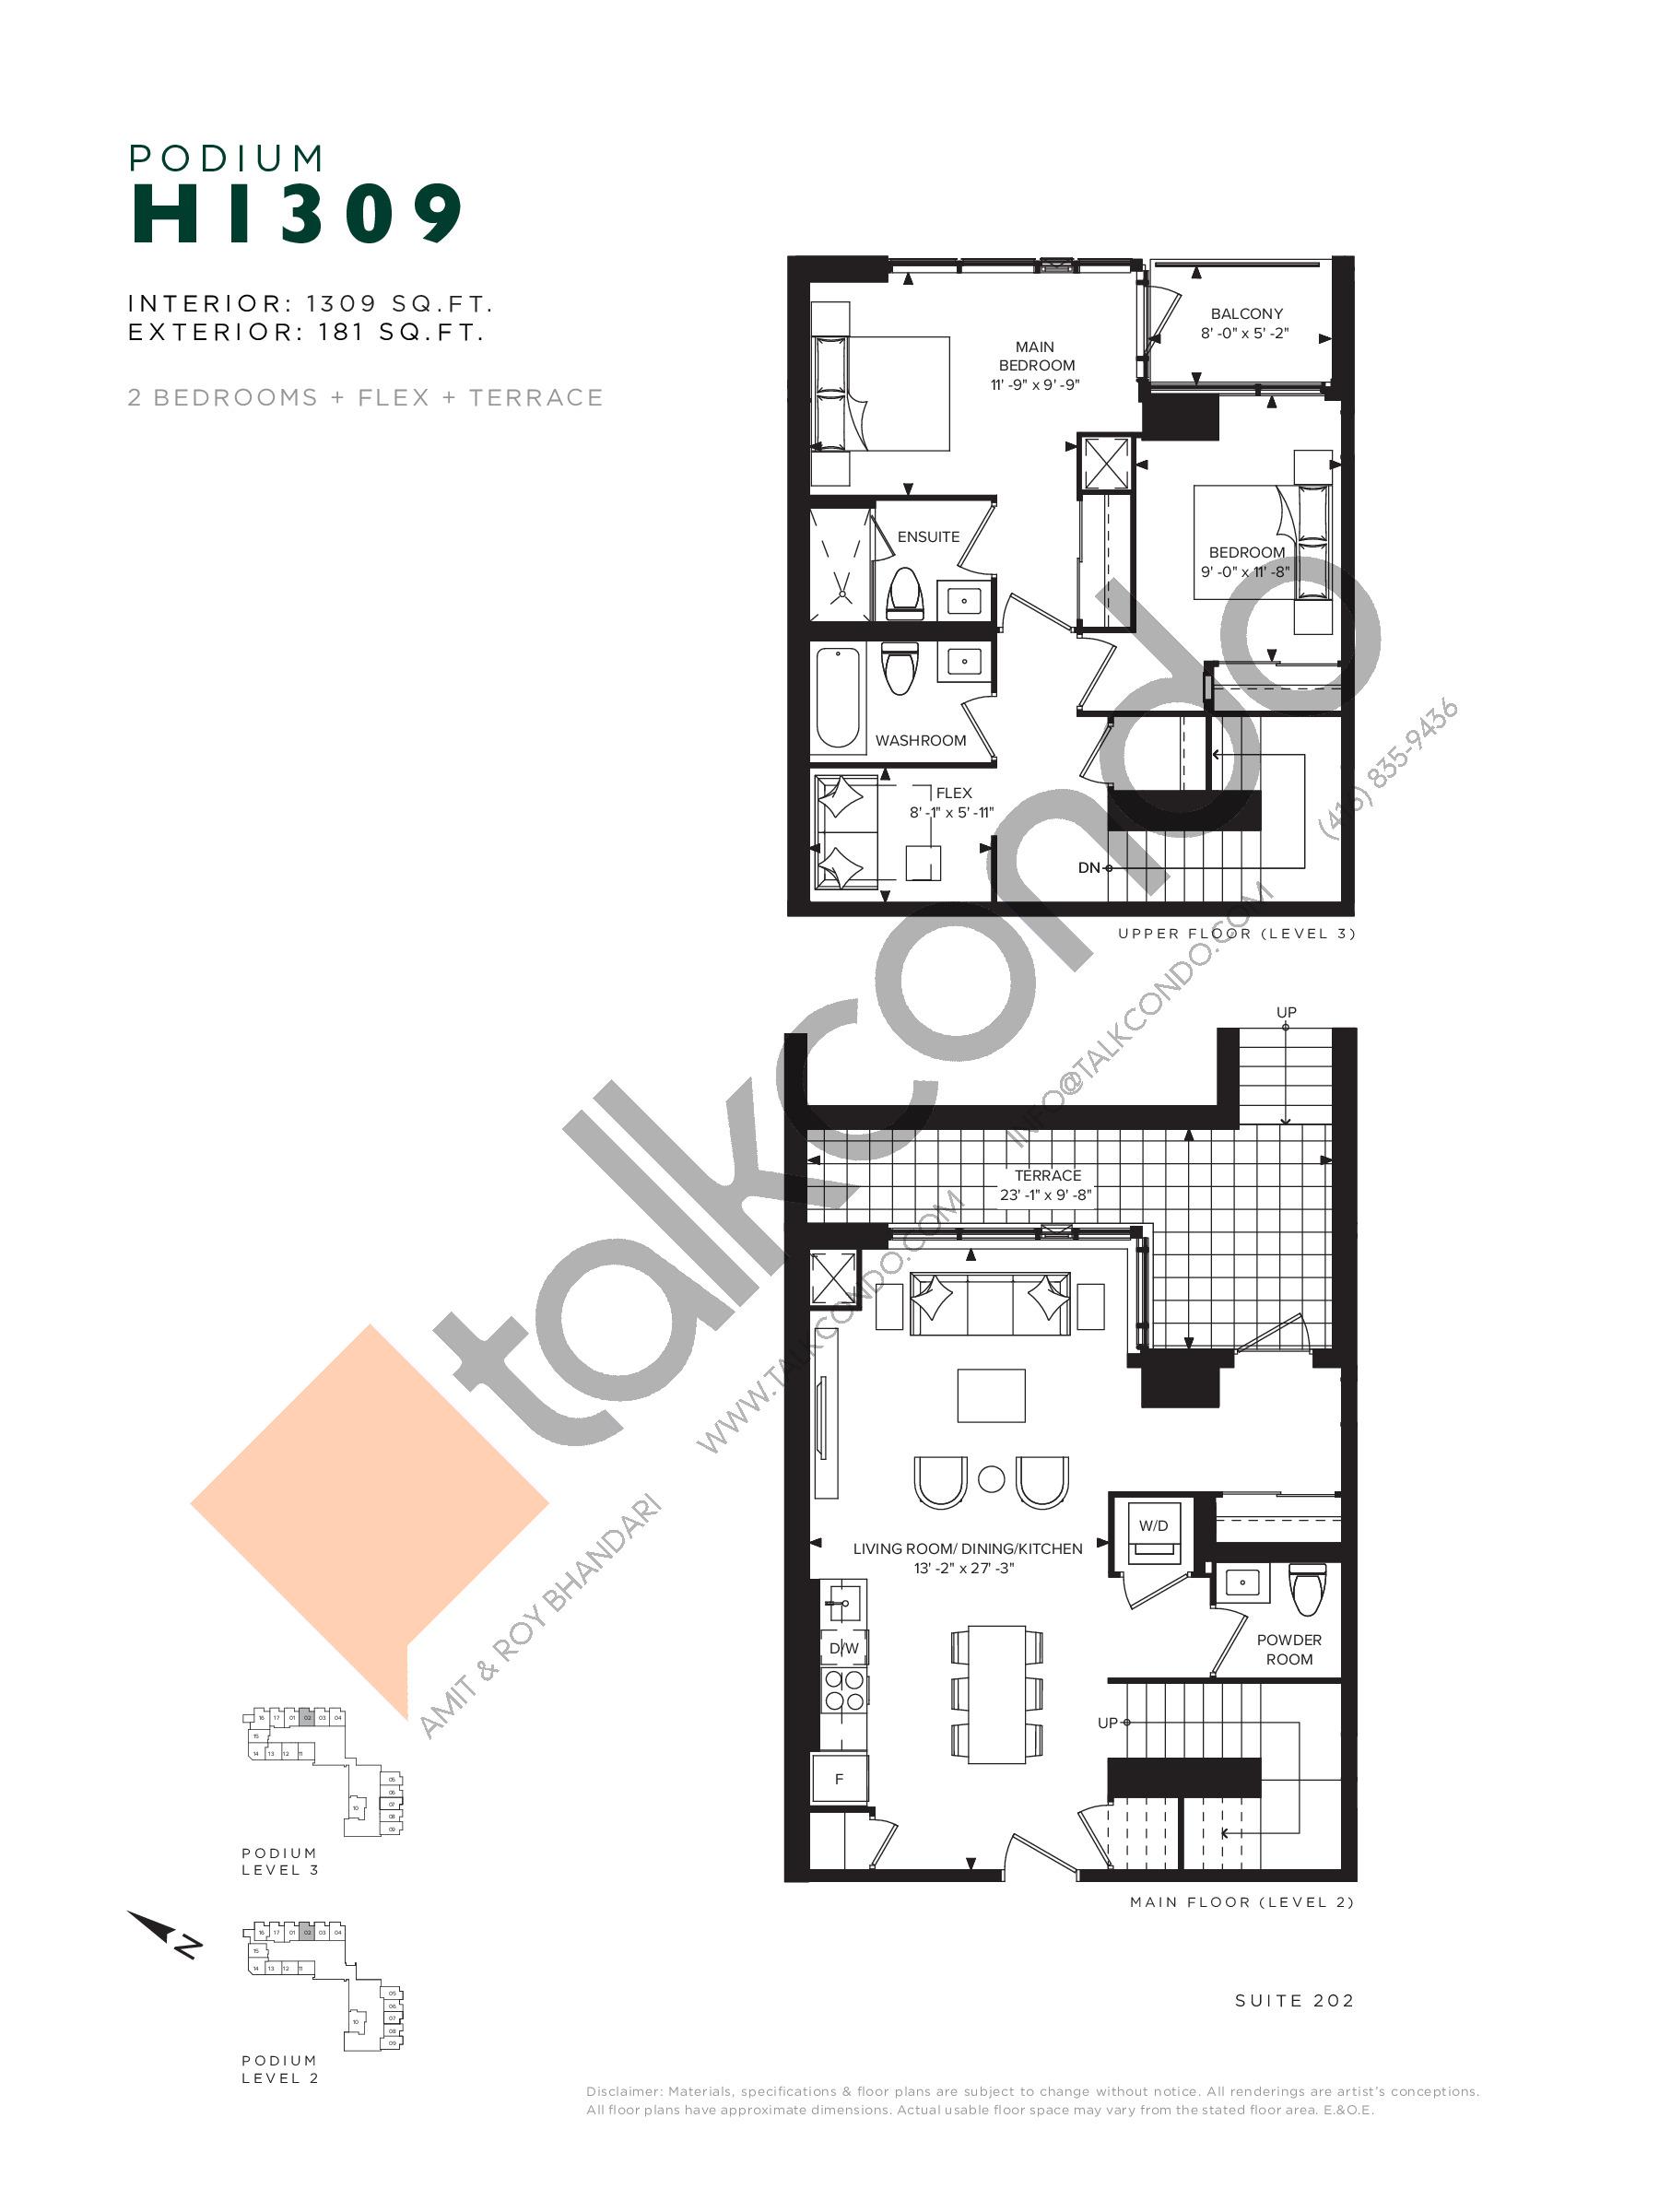 H1309 (Podium) Floor Plan at Hillmont at SXSW Condos - 1309 sq.ft